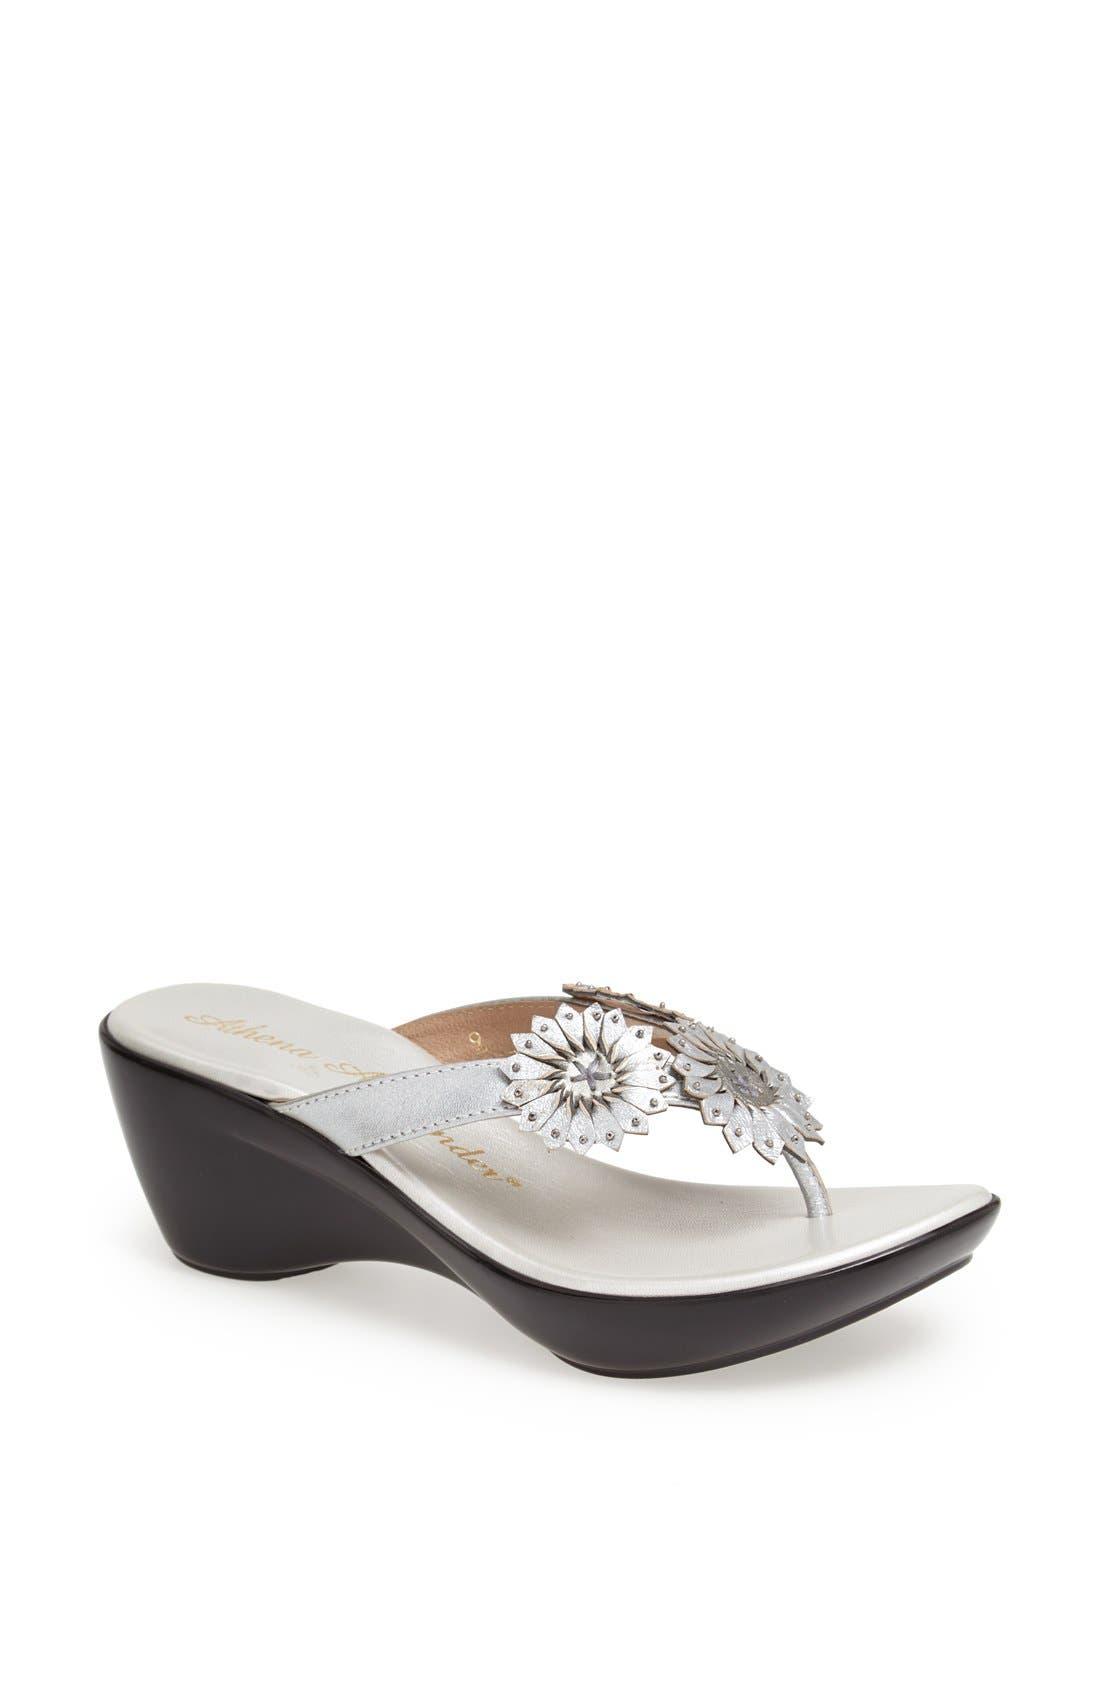 Main Image - Athena Alexander 'Clover' Thong Sandal